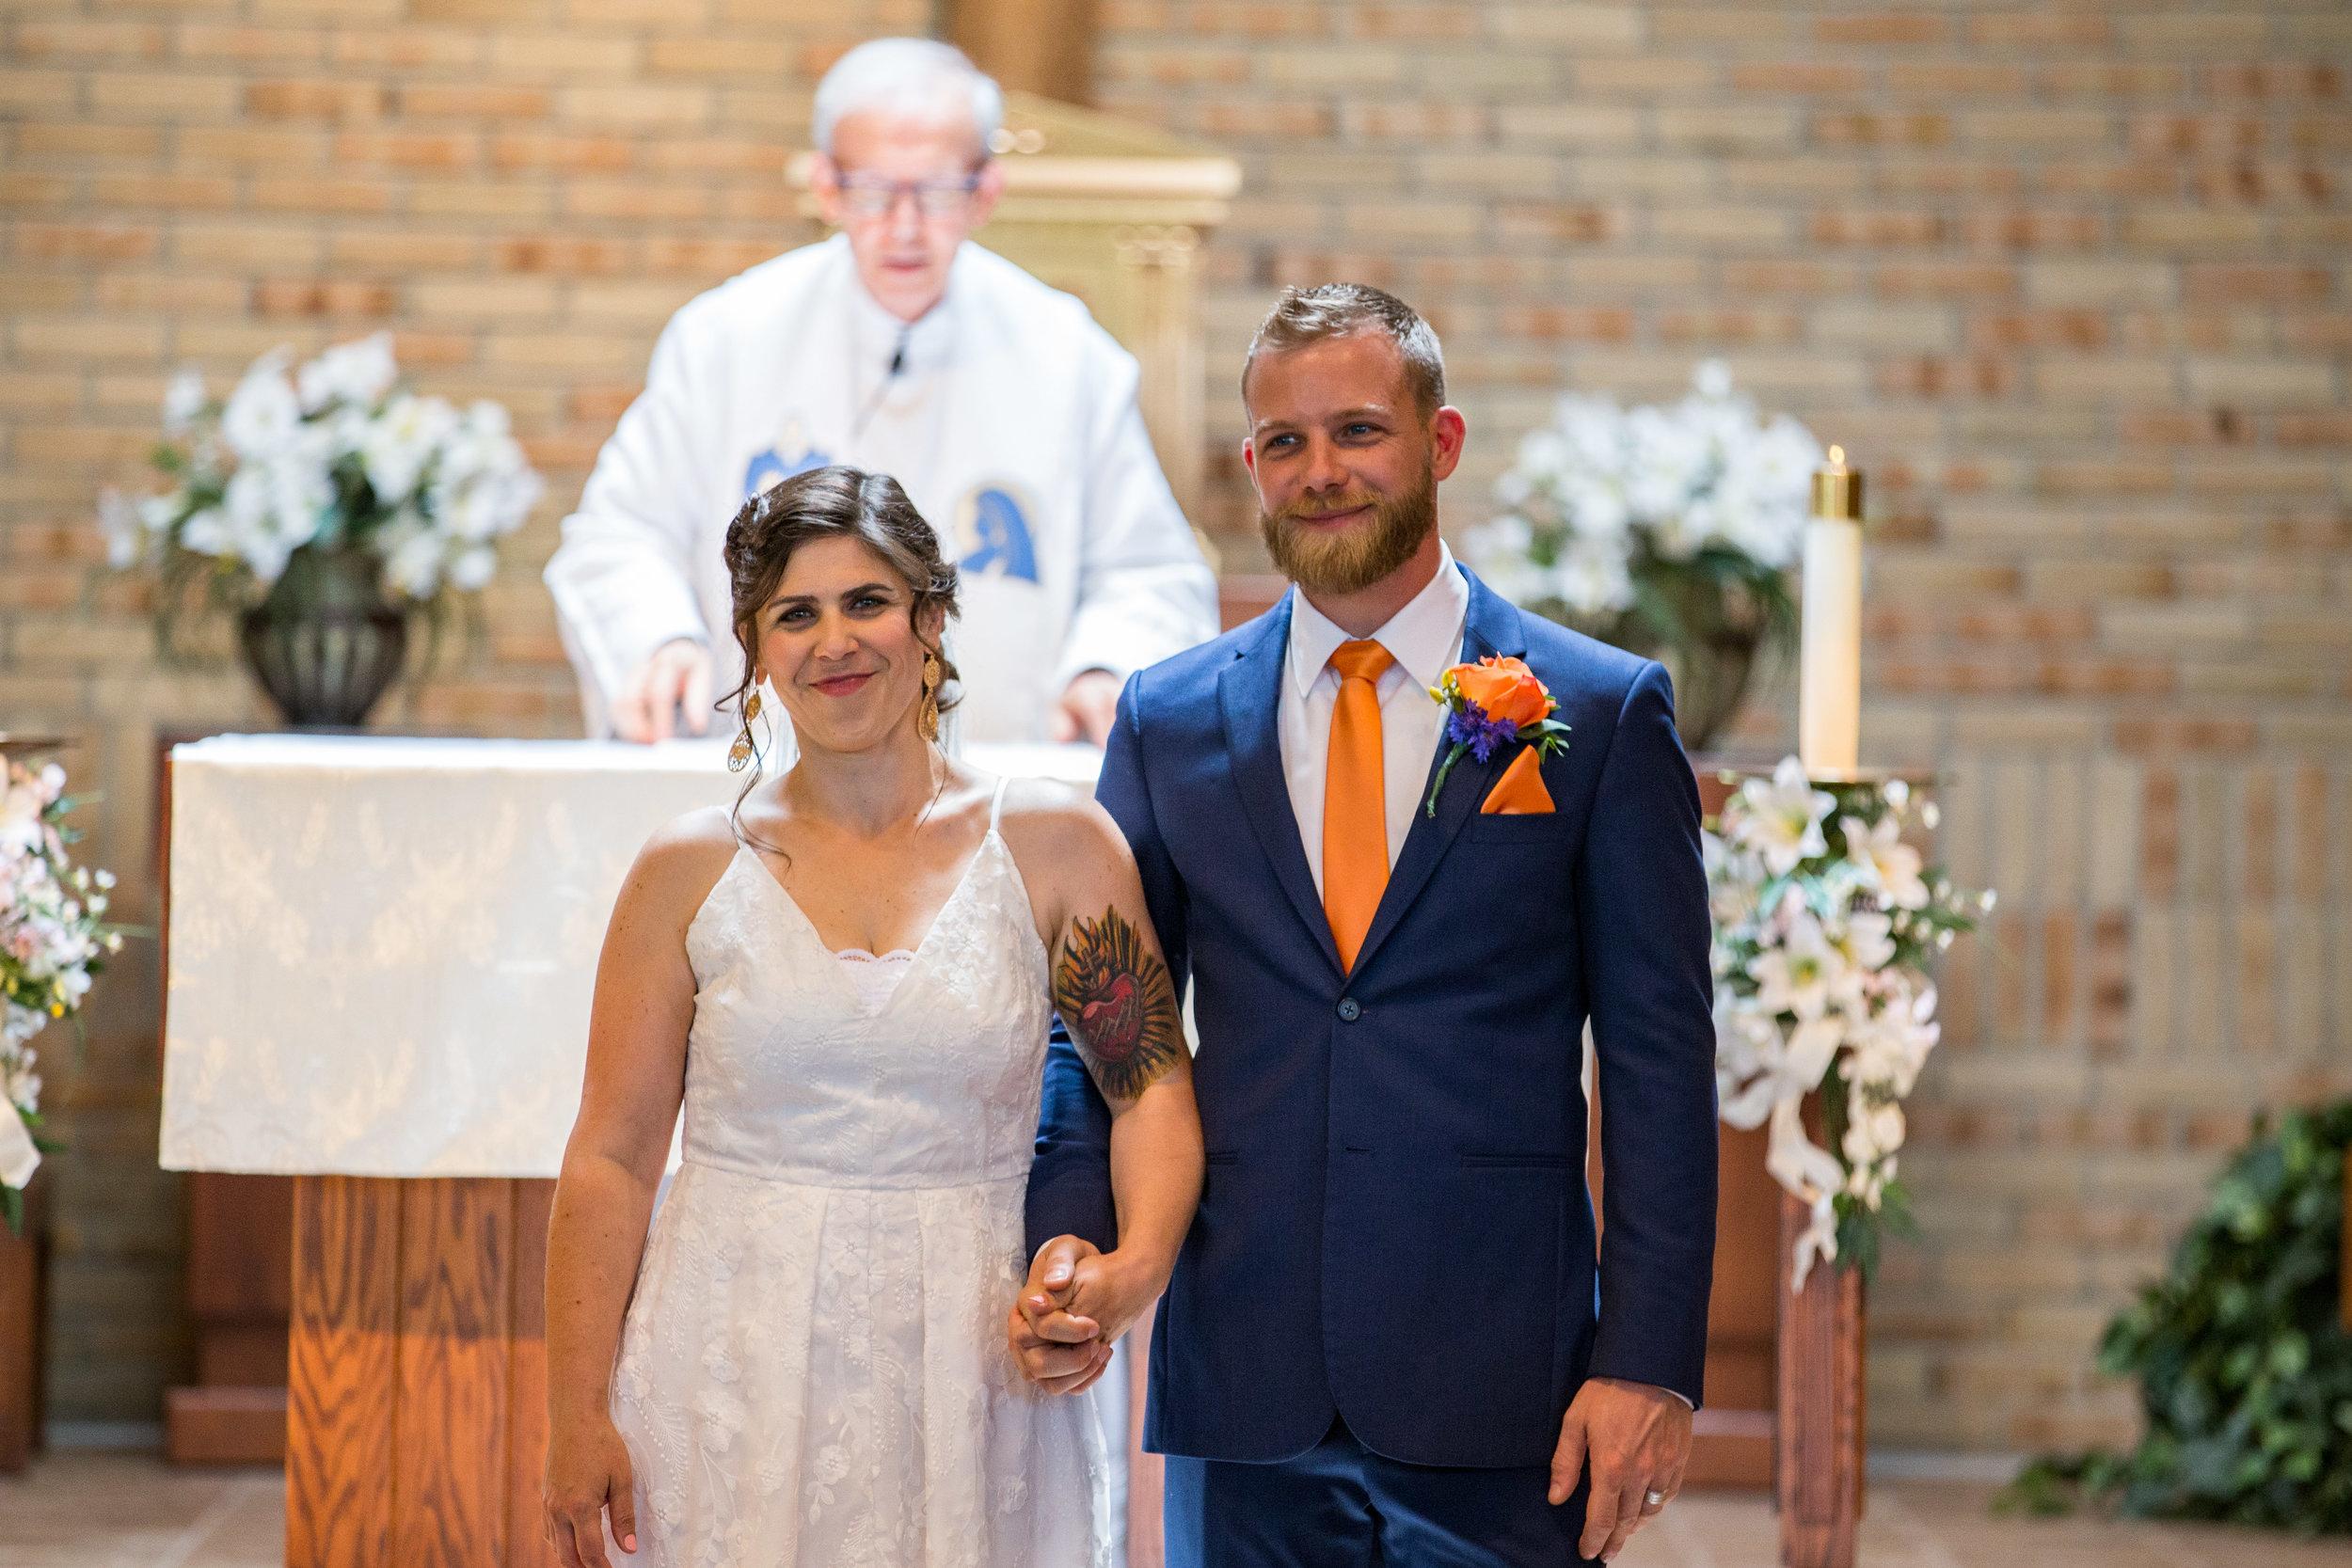 Natalie and Dallas Mooney Wedding 6-8-19_Tania Watt Photography-146.jpg